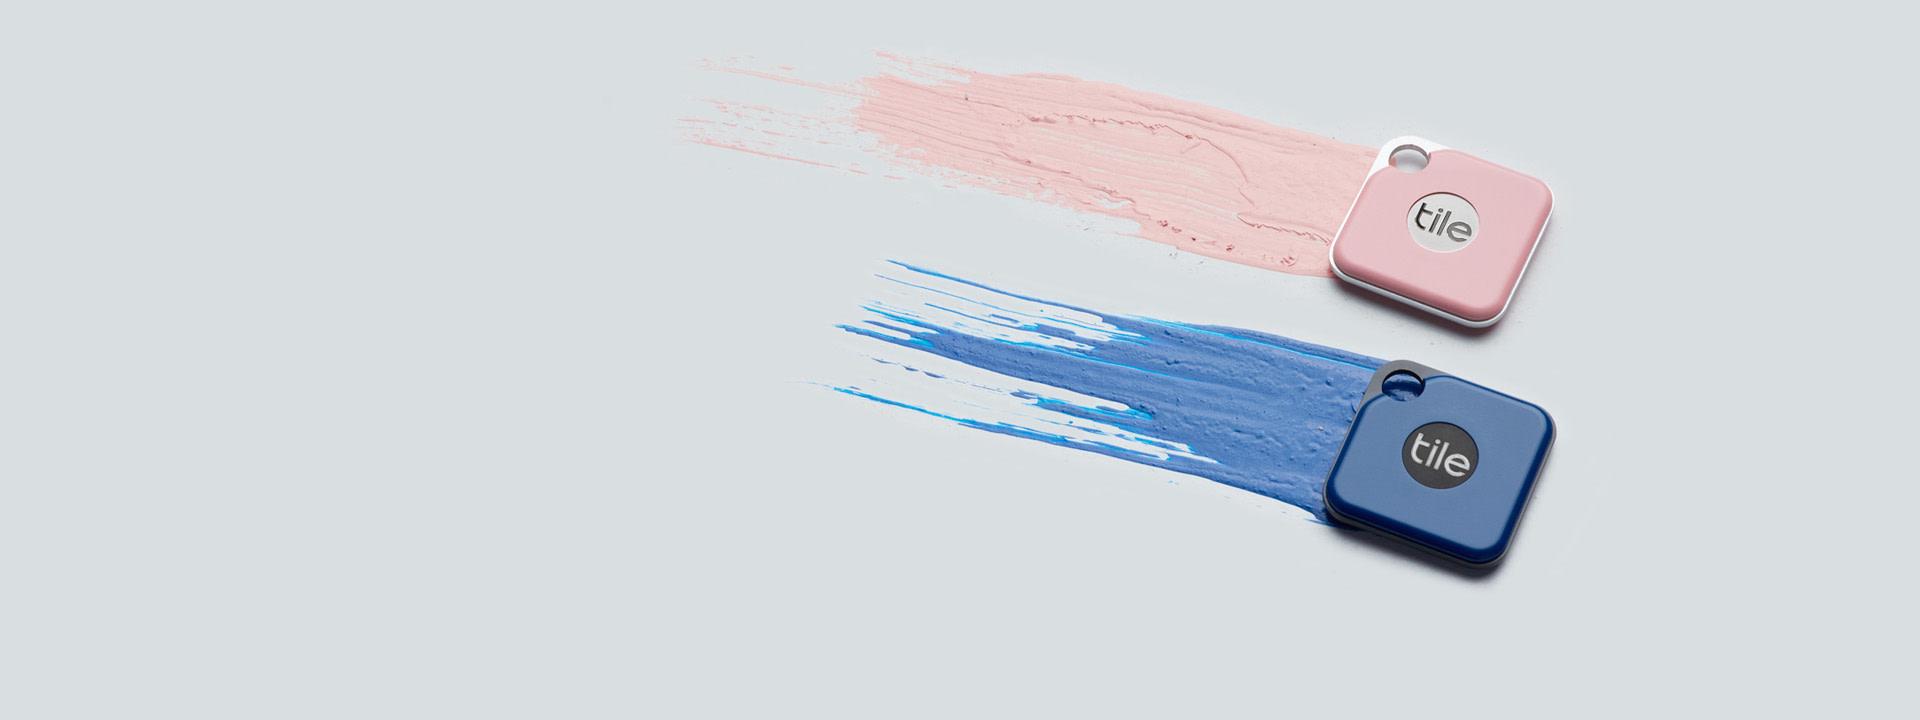 SP21-Desktop-Inline-Colorway-Azurite-Rose-Pro-2-Pack-Marquee